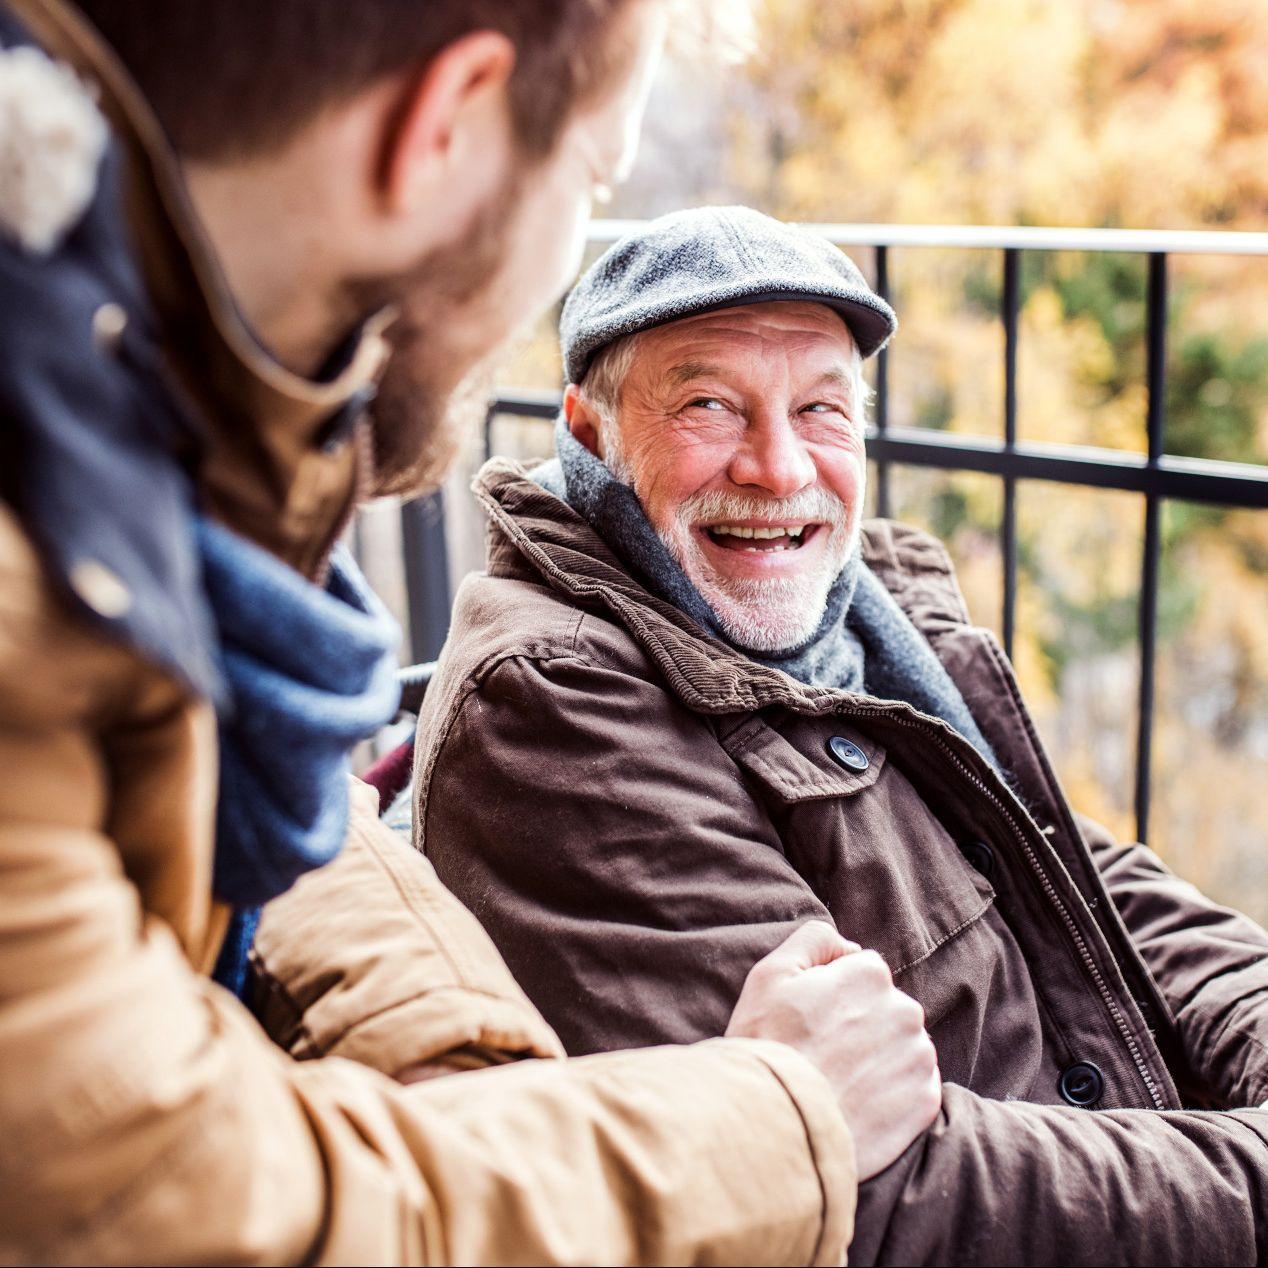 Pflegedienst Jan Hanus Seniorenbetreuung